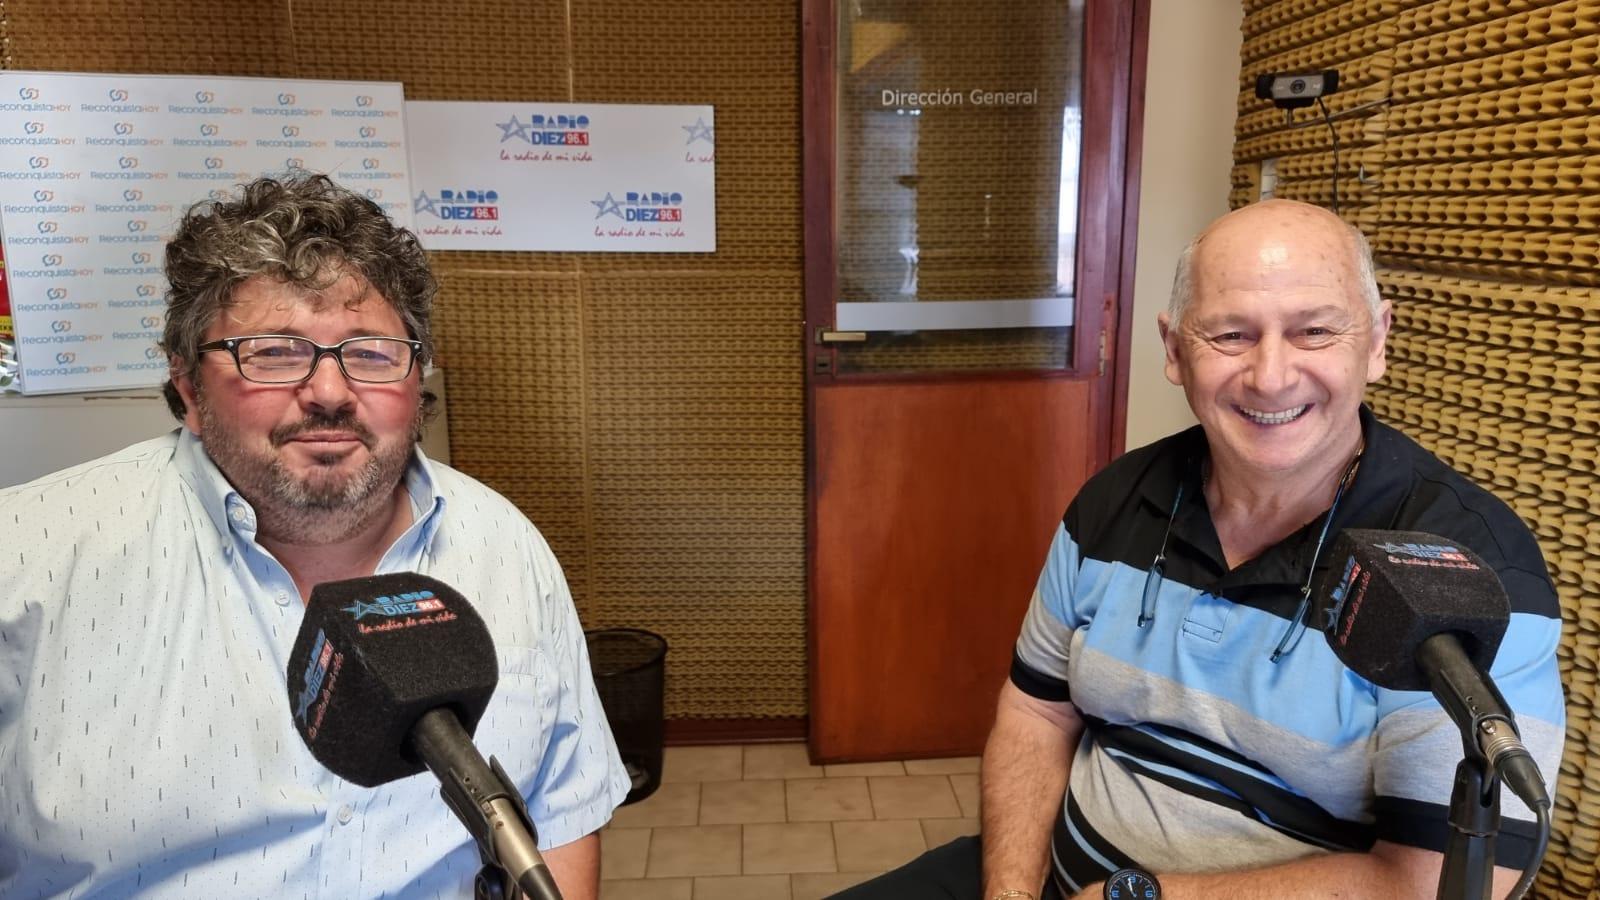 Rubén Snaider y Lelo Mathieu.jpg